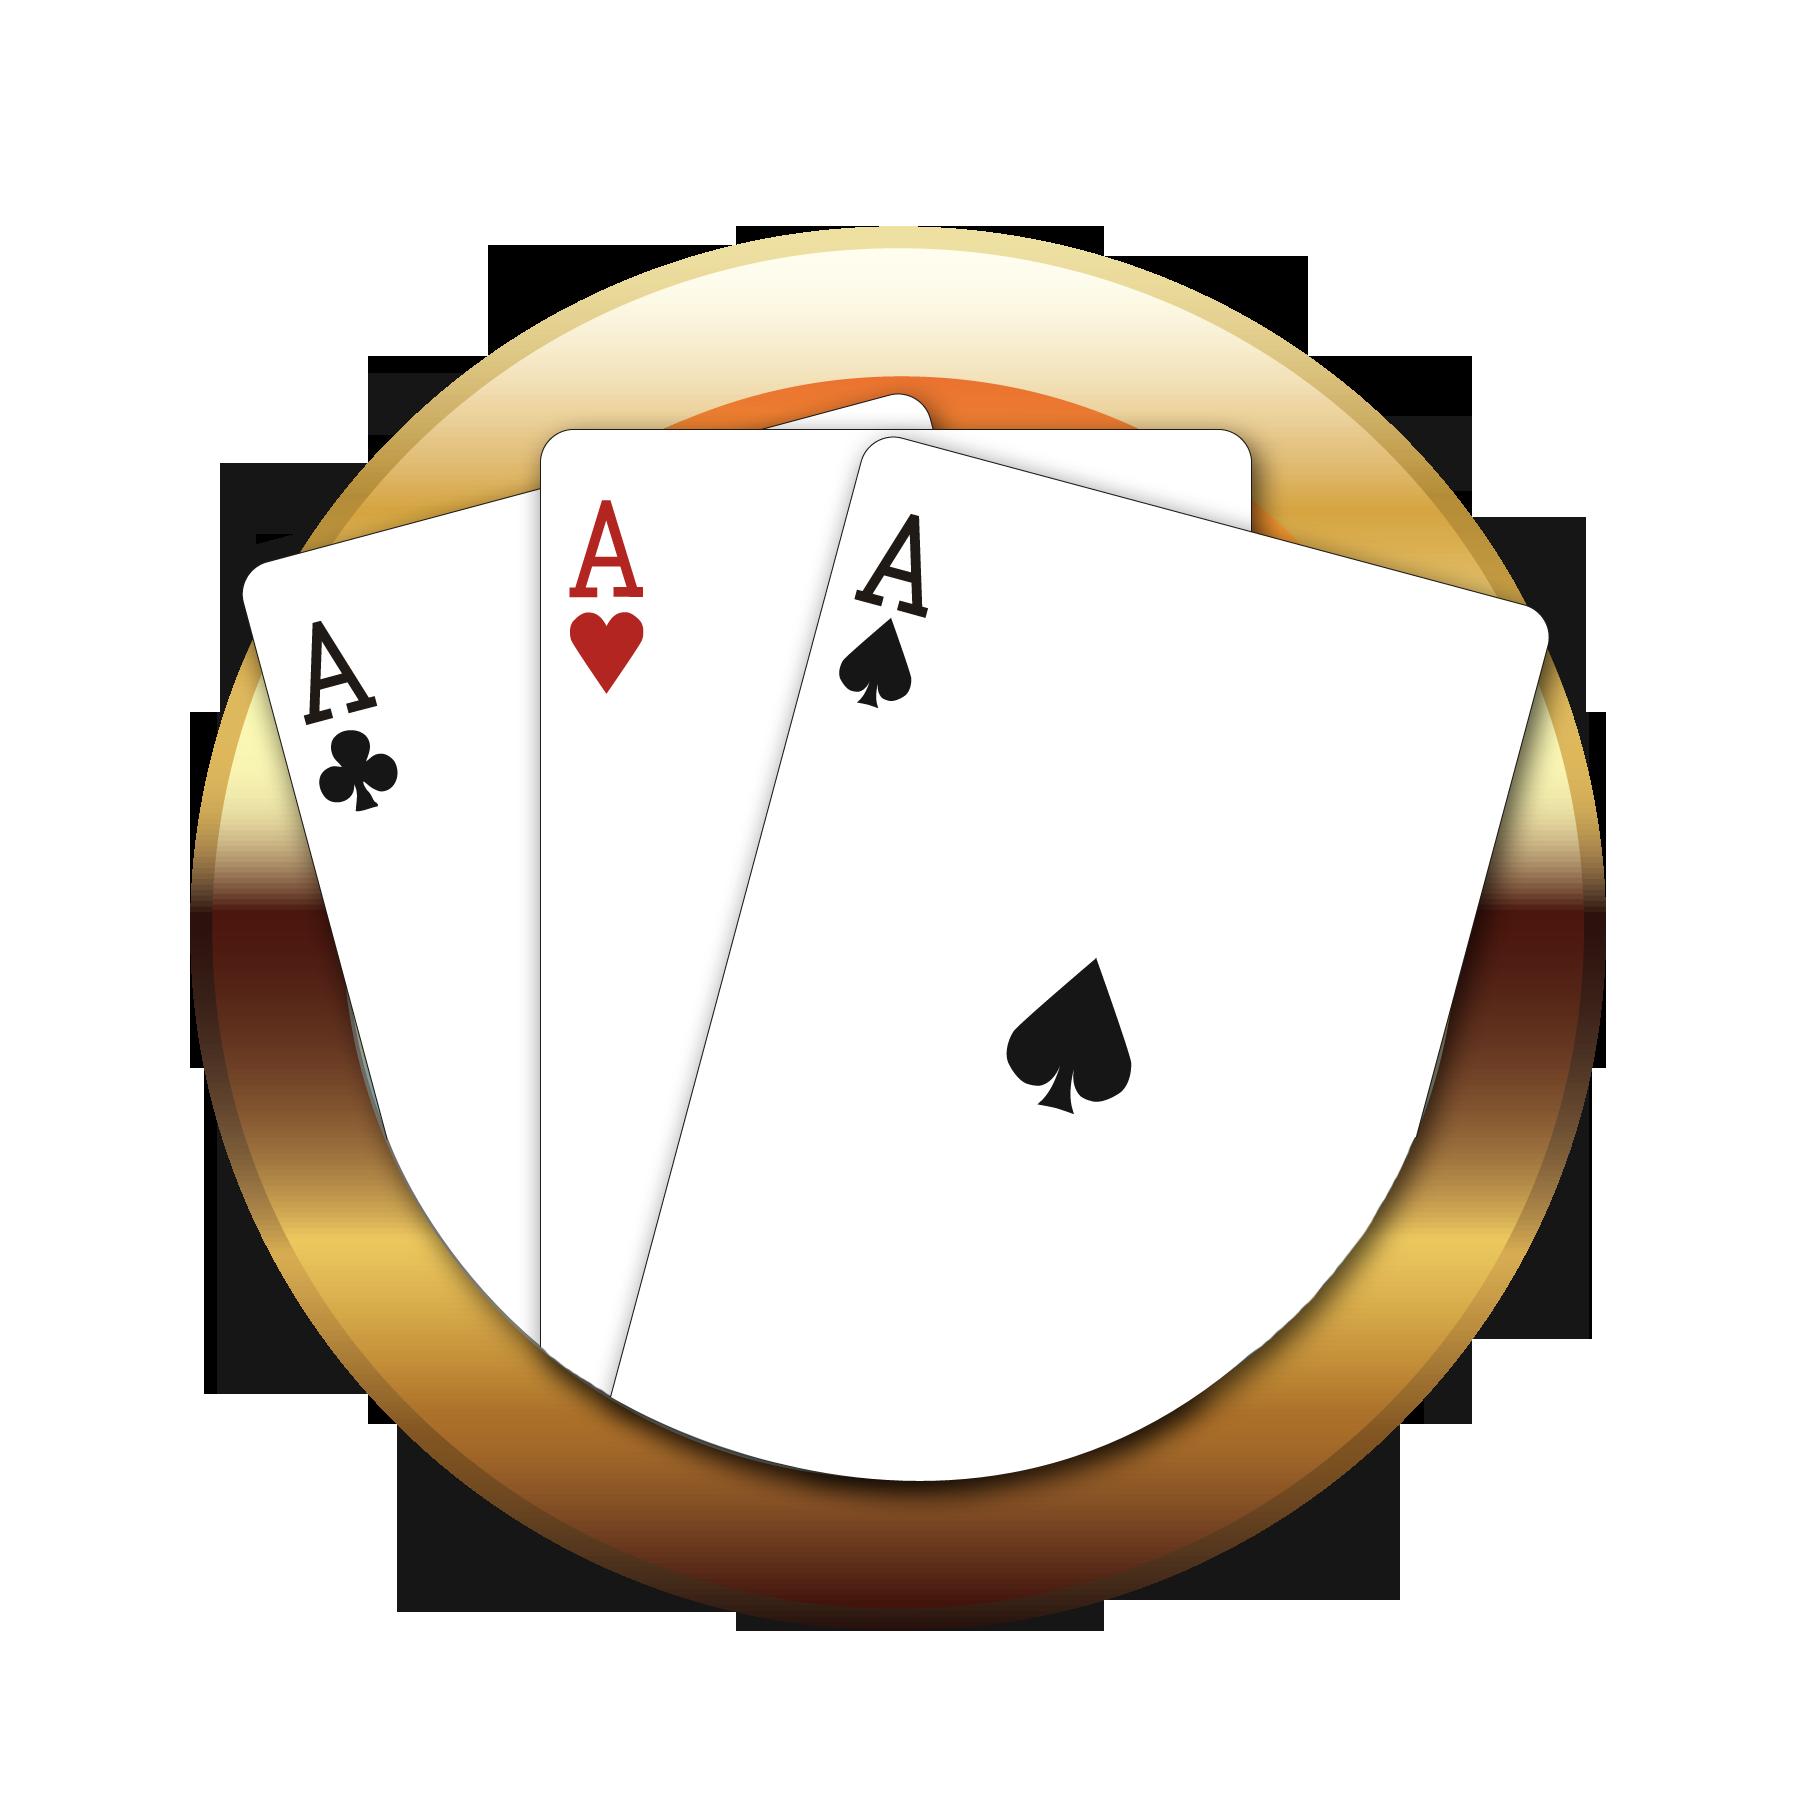 Hasil gambar untuk card poker